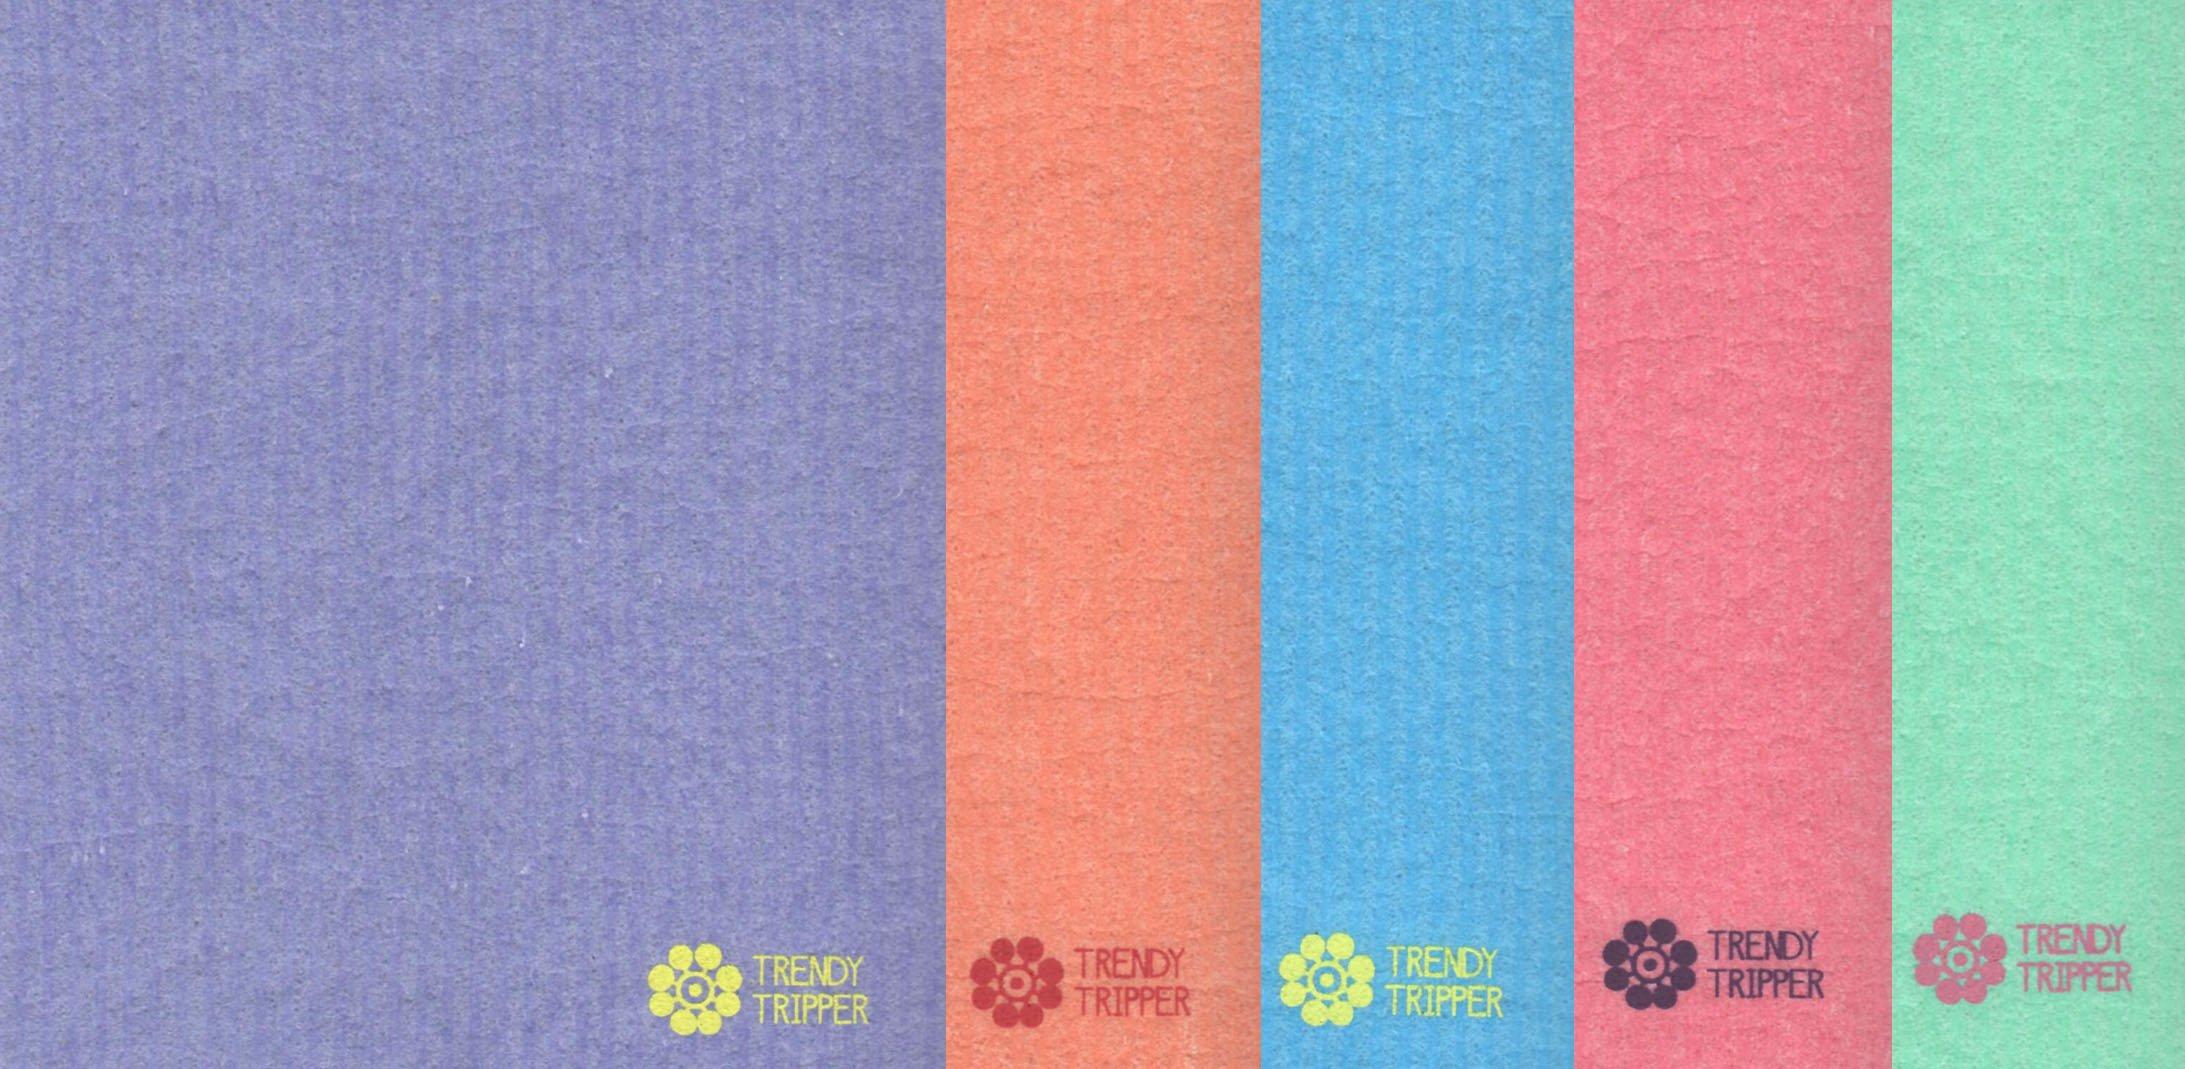 Swedish Dishcloths, Reusable Set of 5 Mixed Solid Colors (FIVE)